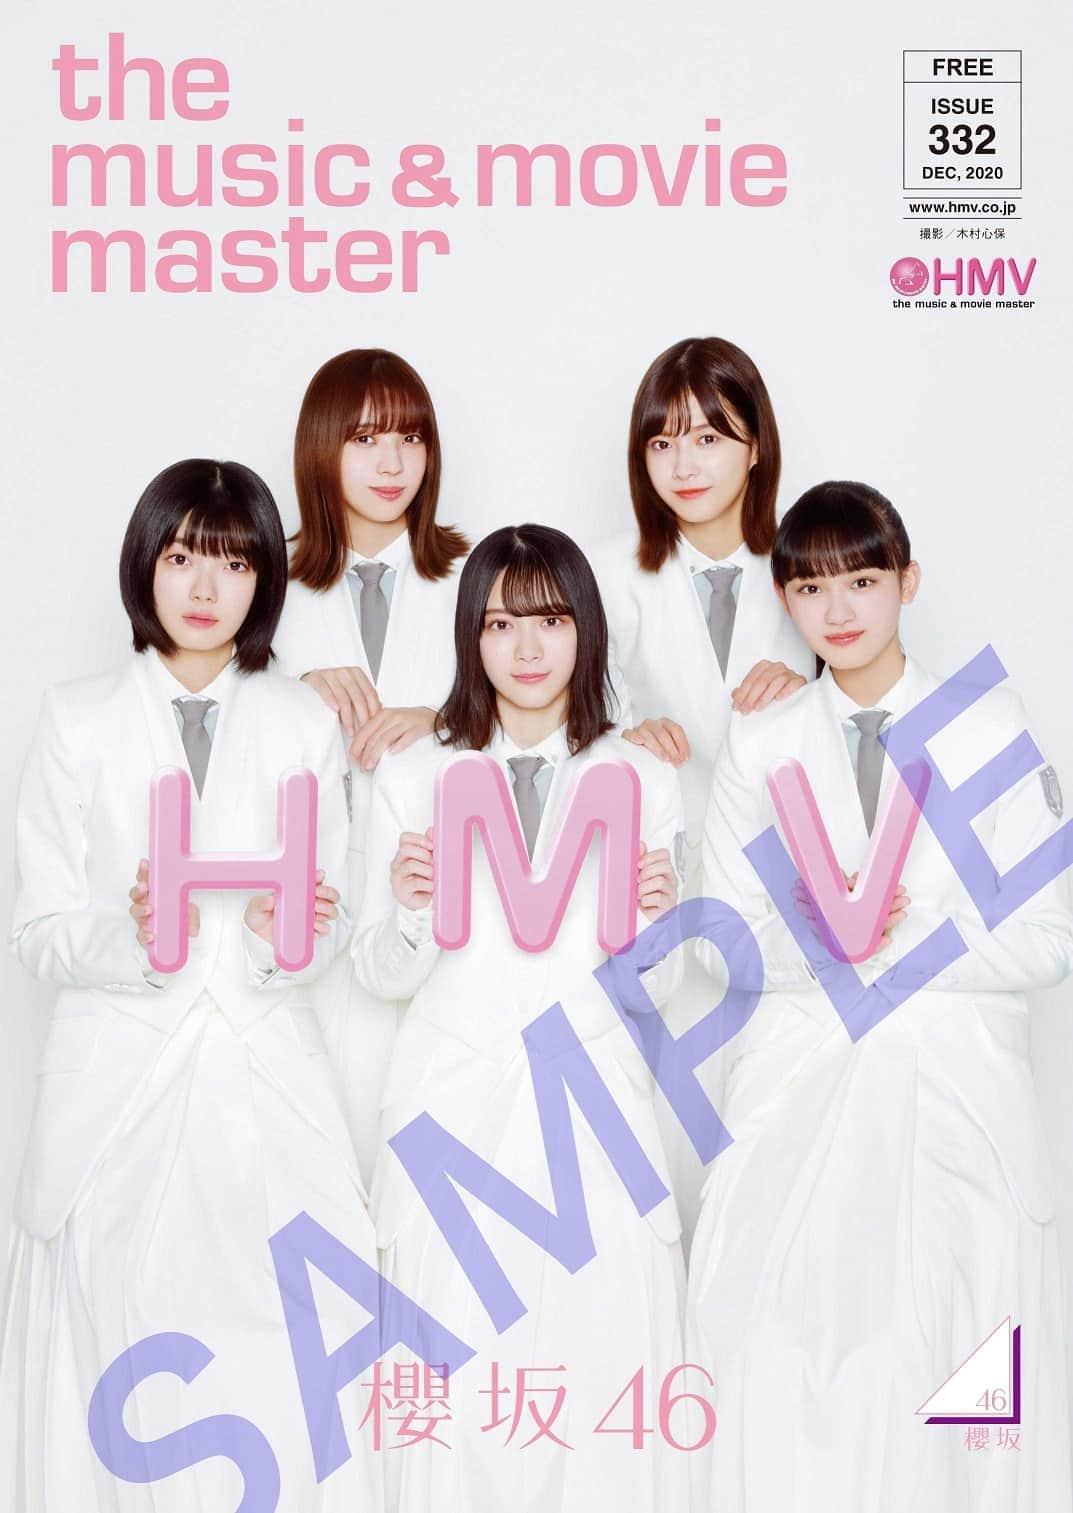 _HMV冊子SAMPLE画像_s